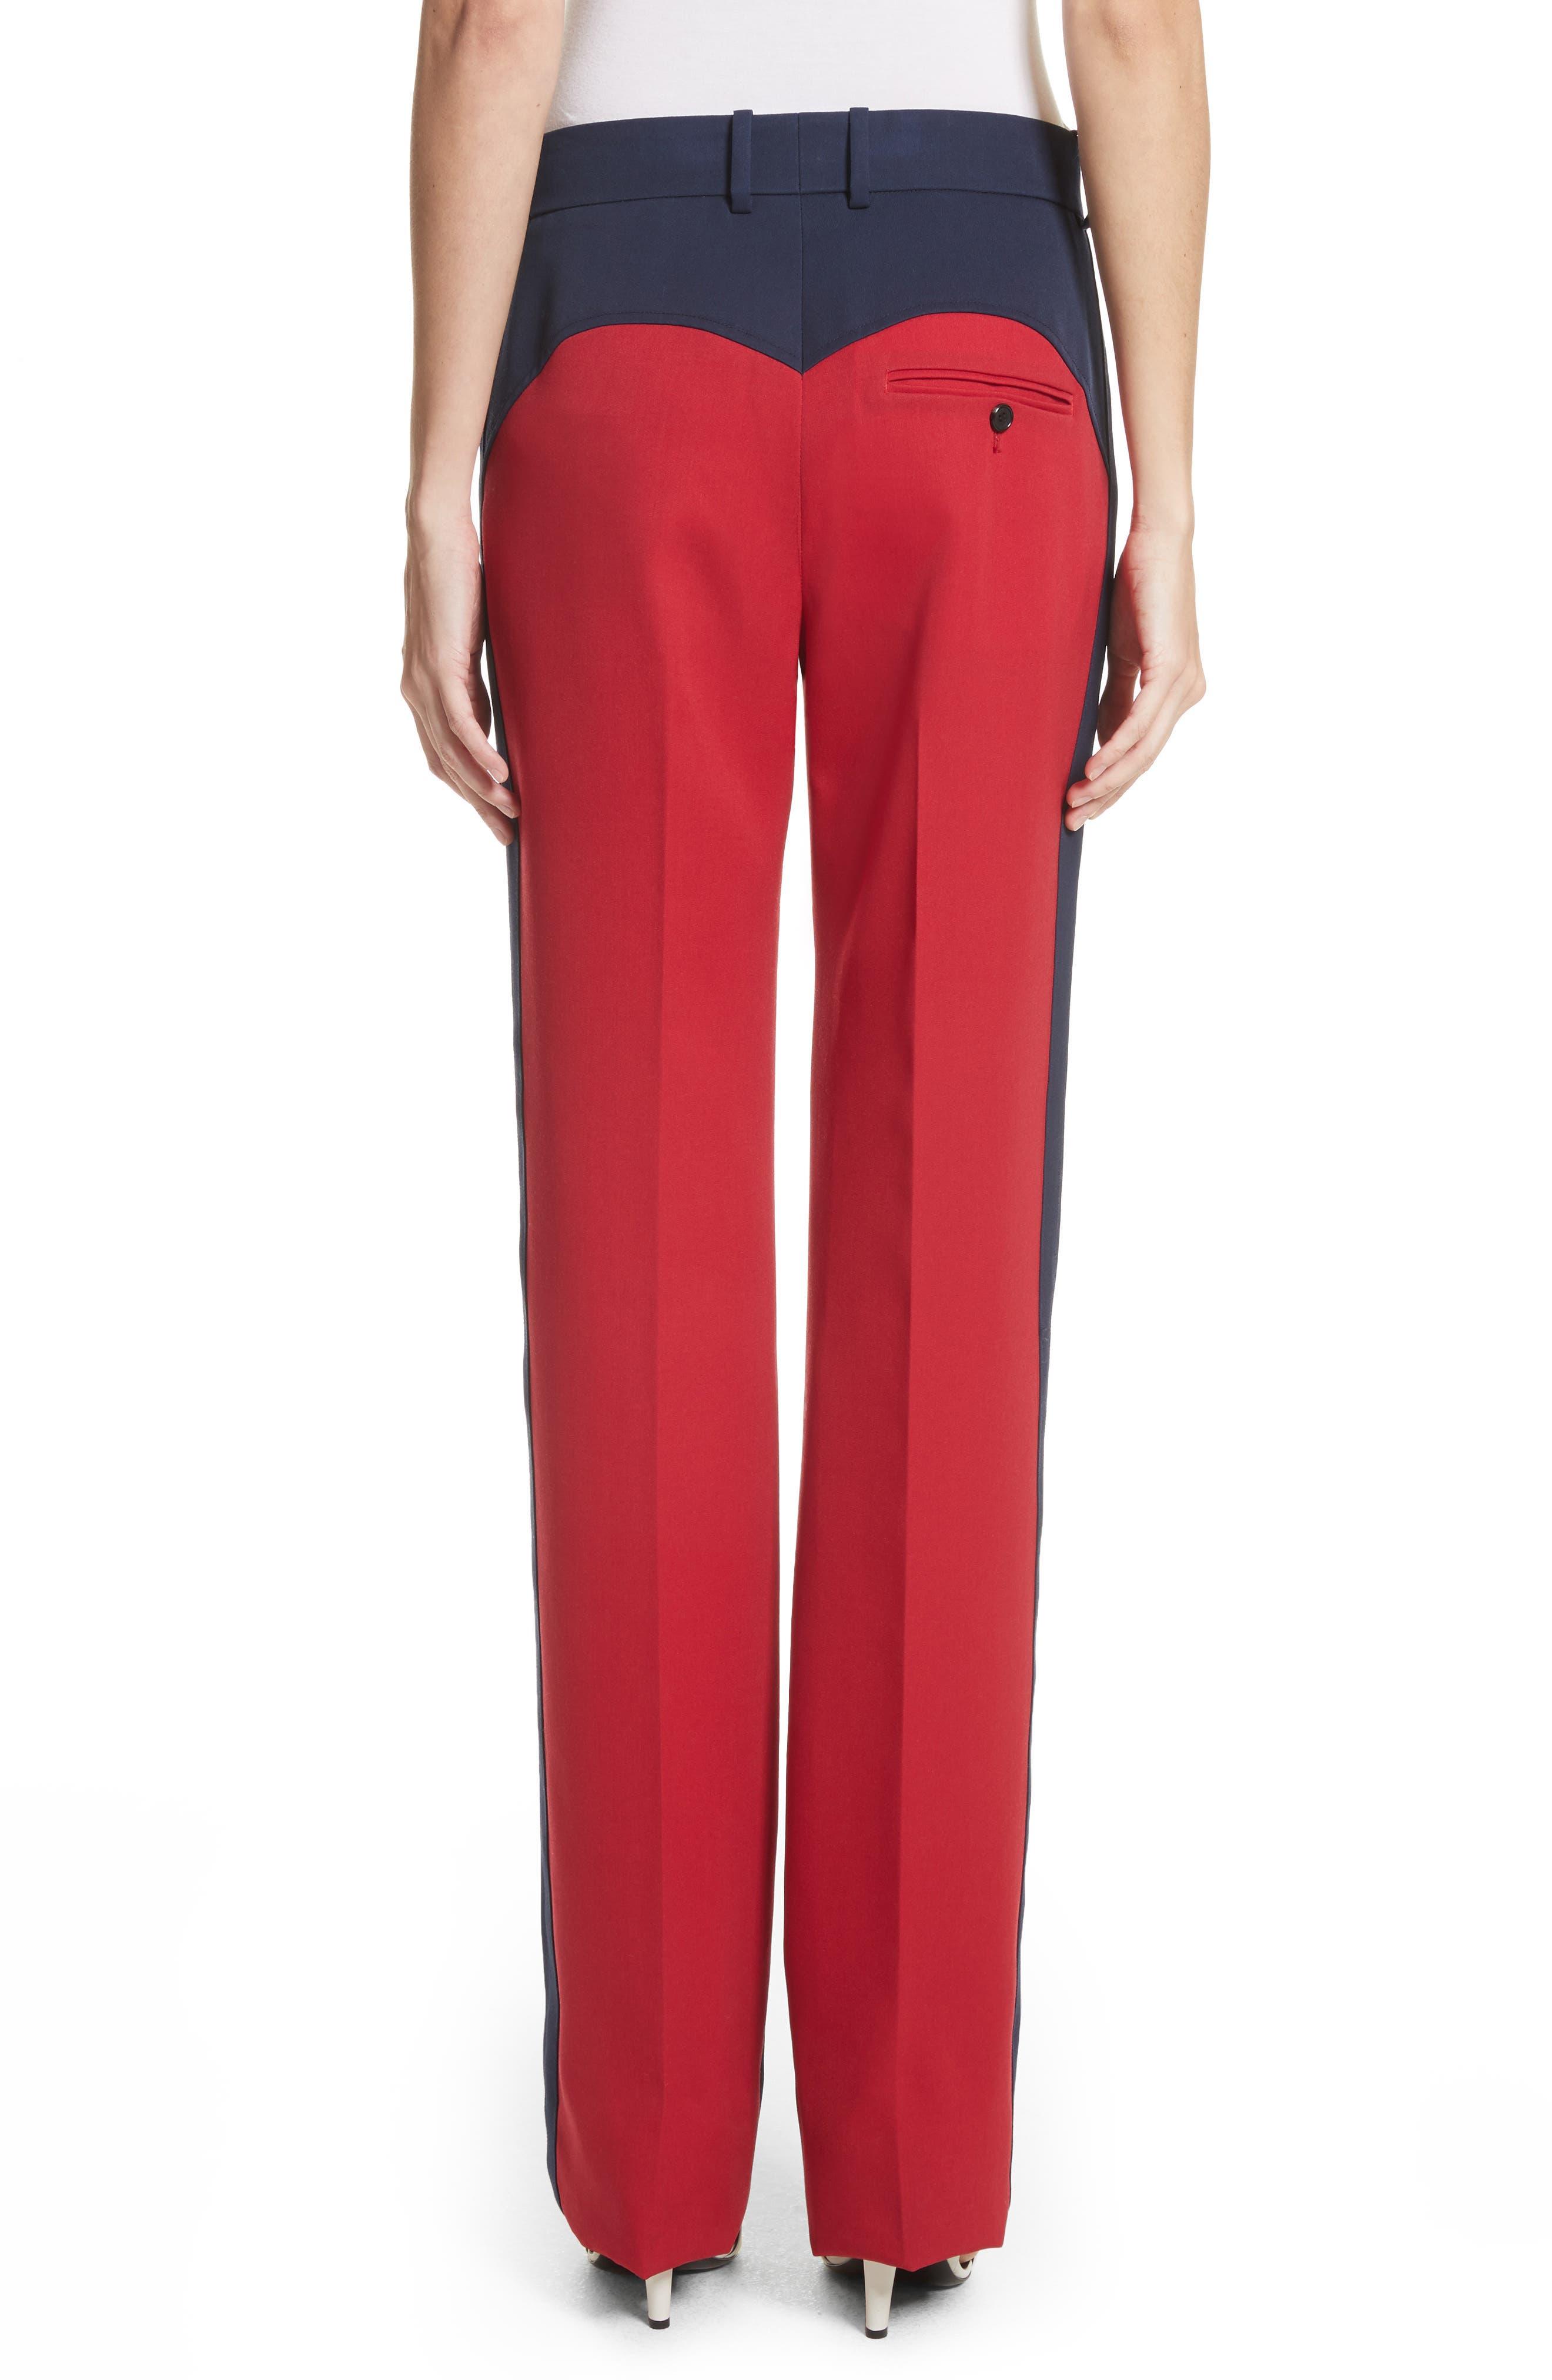 Alternate Image 3  - CALVIN KLEIN 205W39NYC Colorblock Wool Trousers